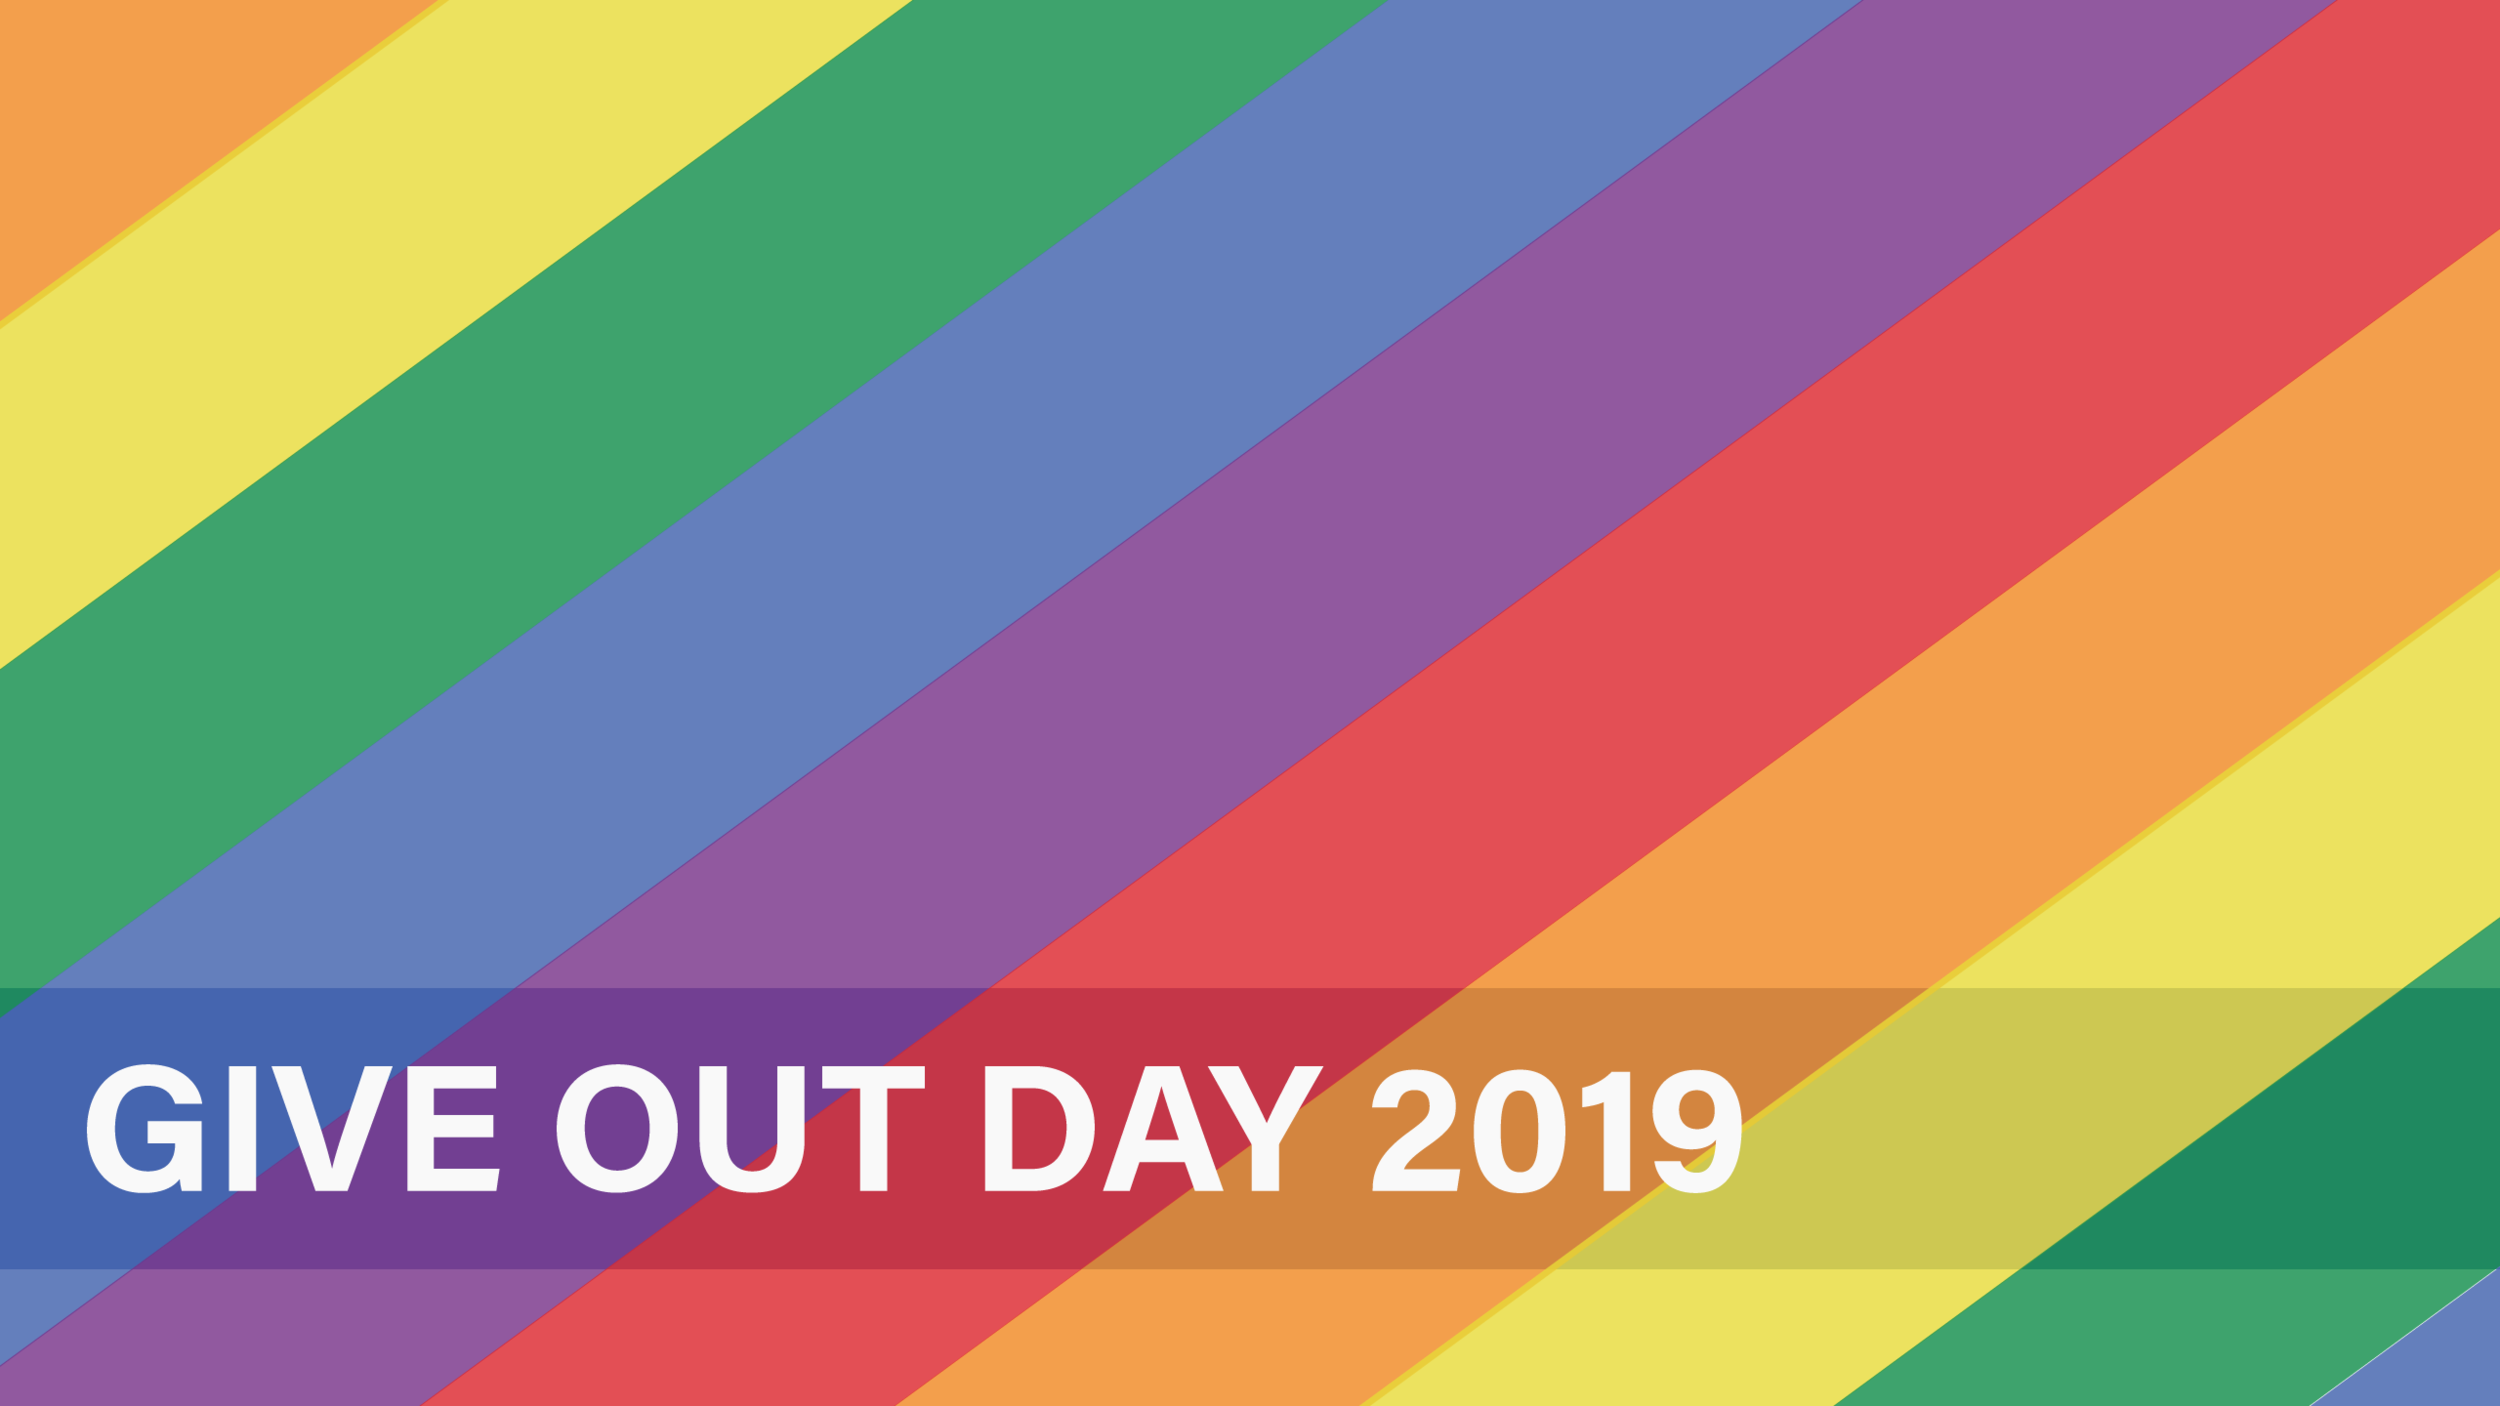 GO-Day-Seethru-Rainbow-Graphic-WEB.png